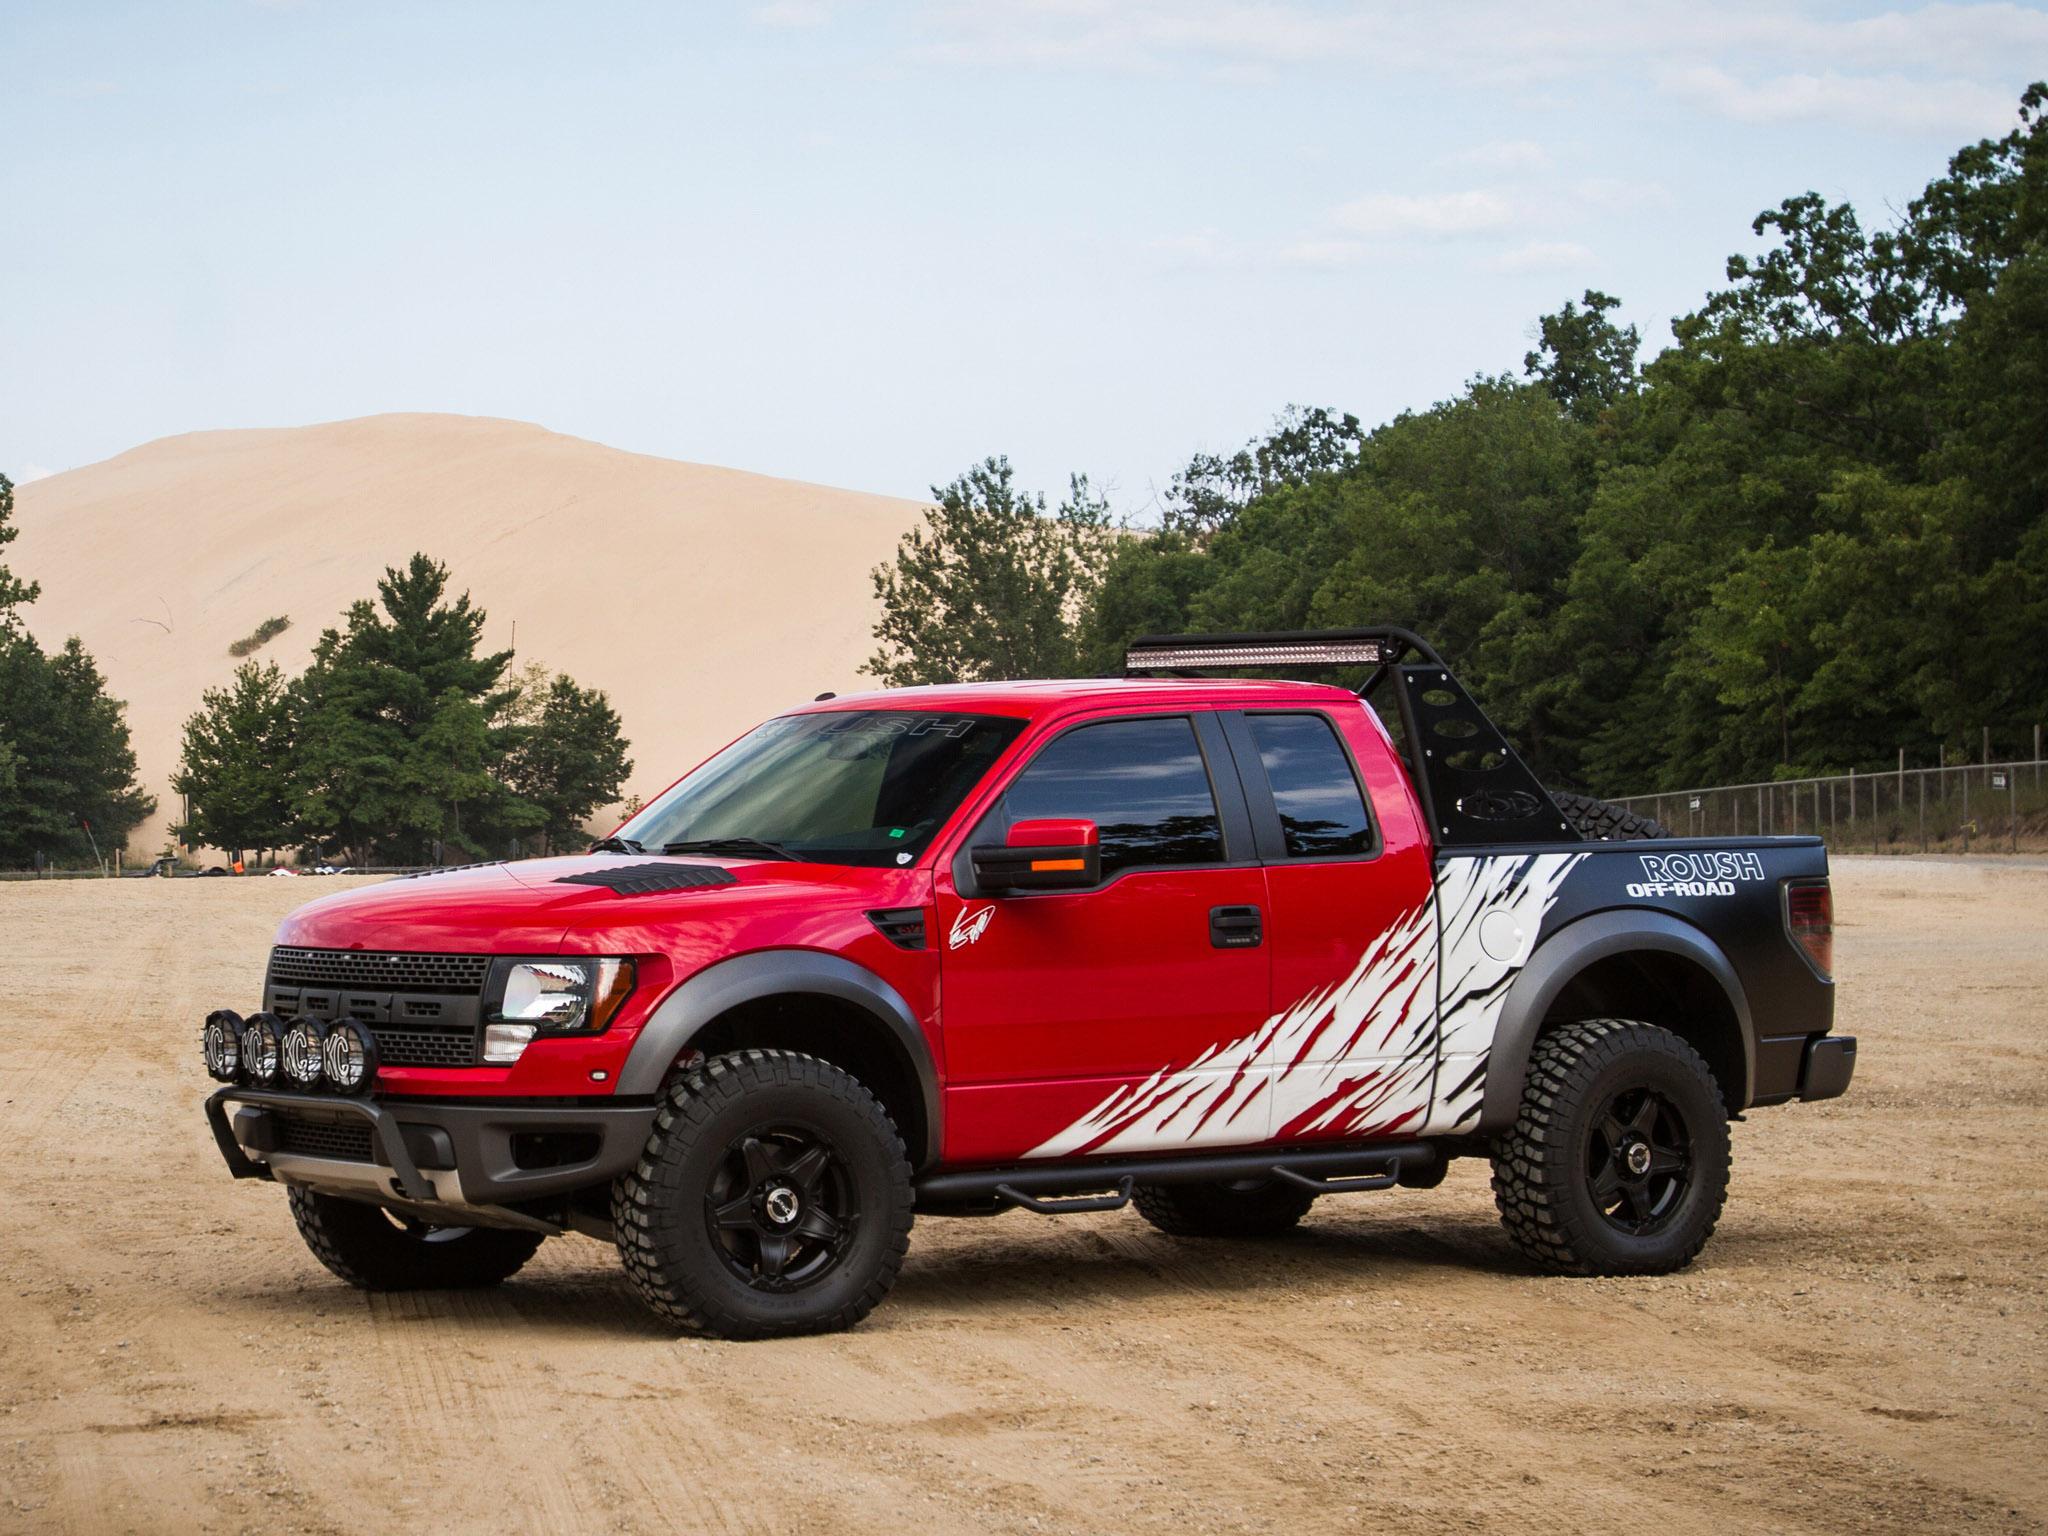 2012 roush ford f 150 svt raptor 4x4 muscle truck h. Black Bedroom Furniture Sets. Home Design Ideas